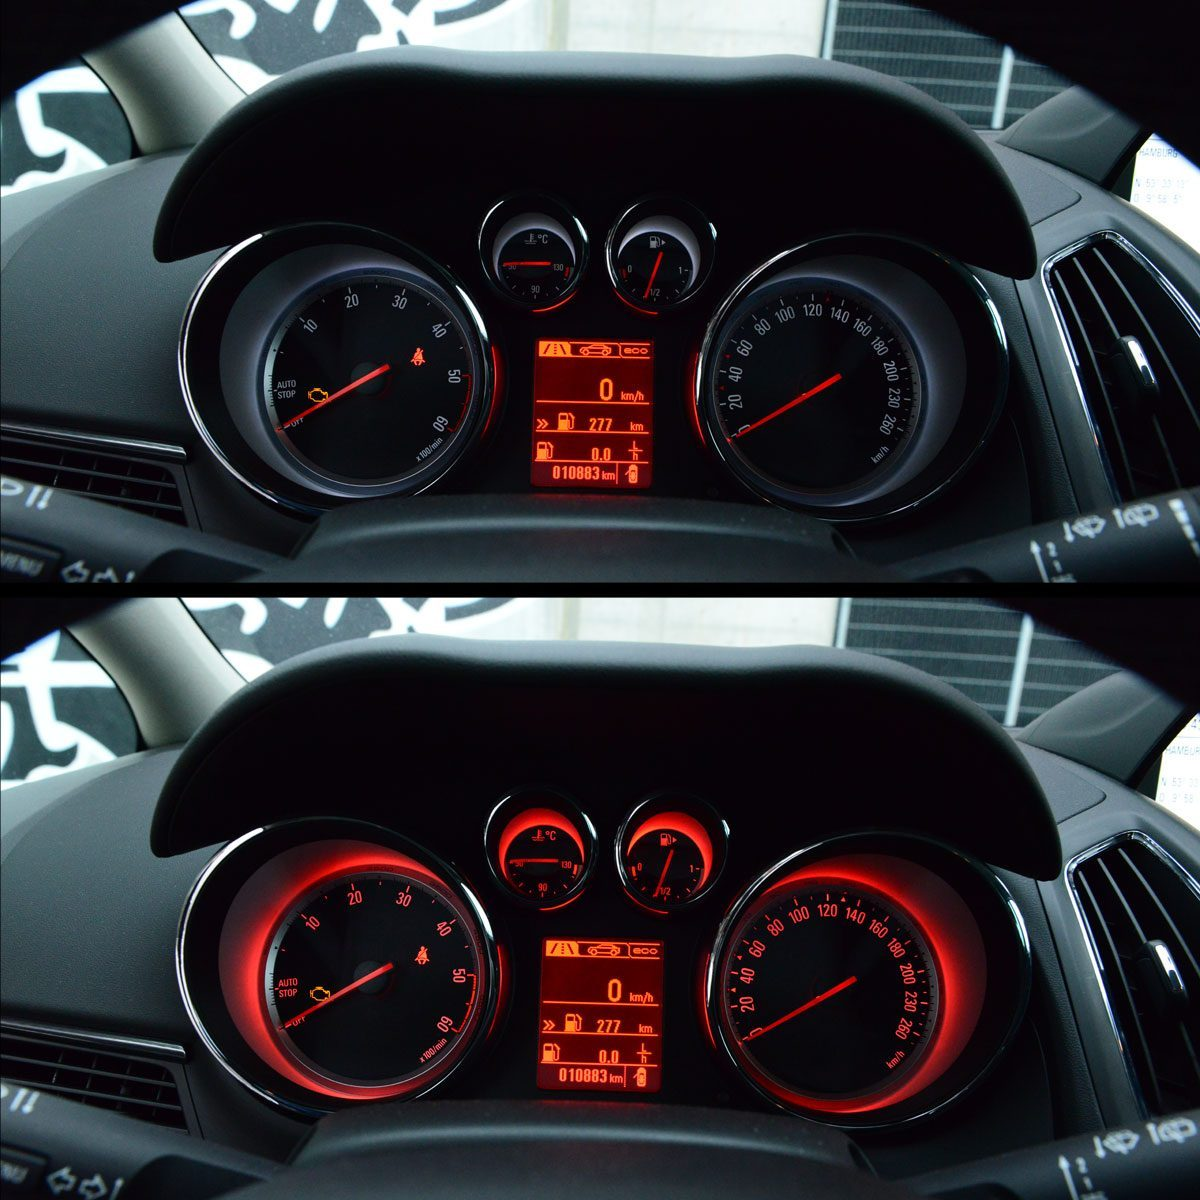 Opel Zafira Tourer Cockpit